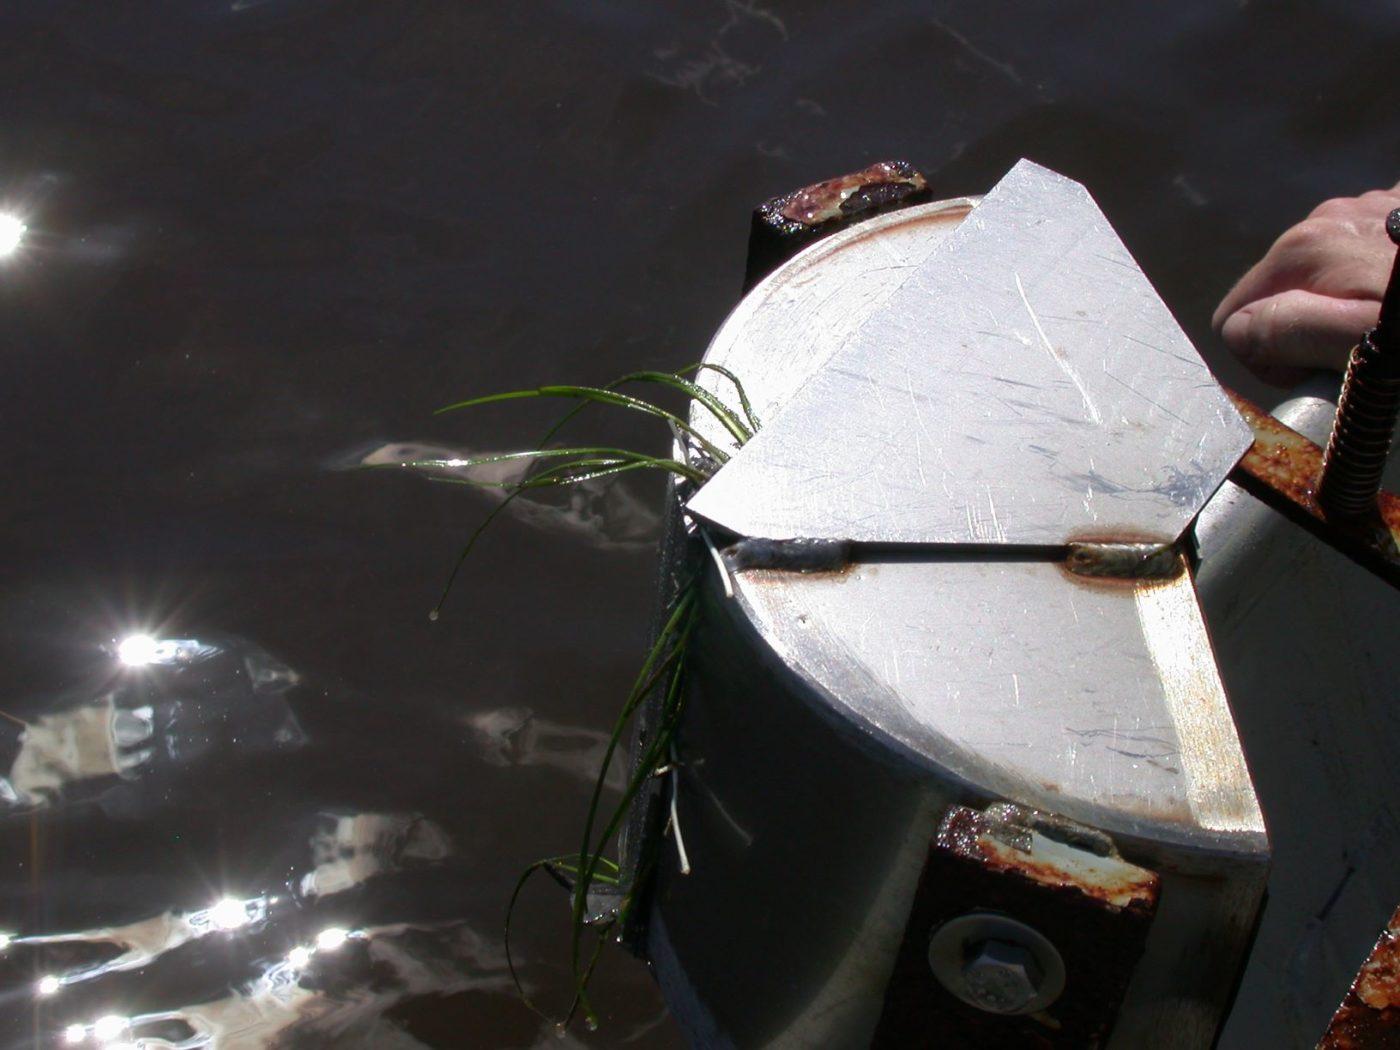 A ponar sample of seagrass.